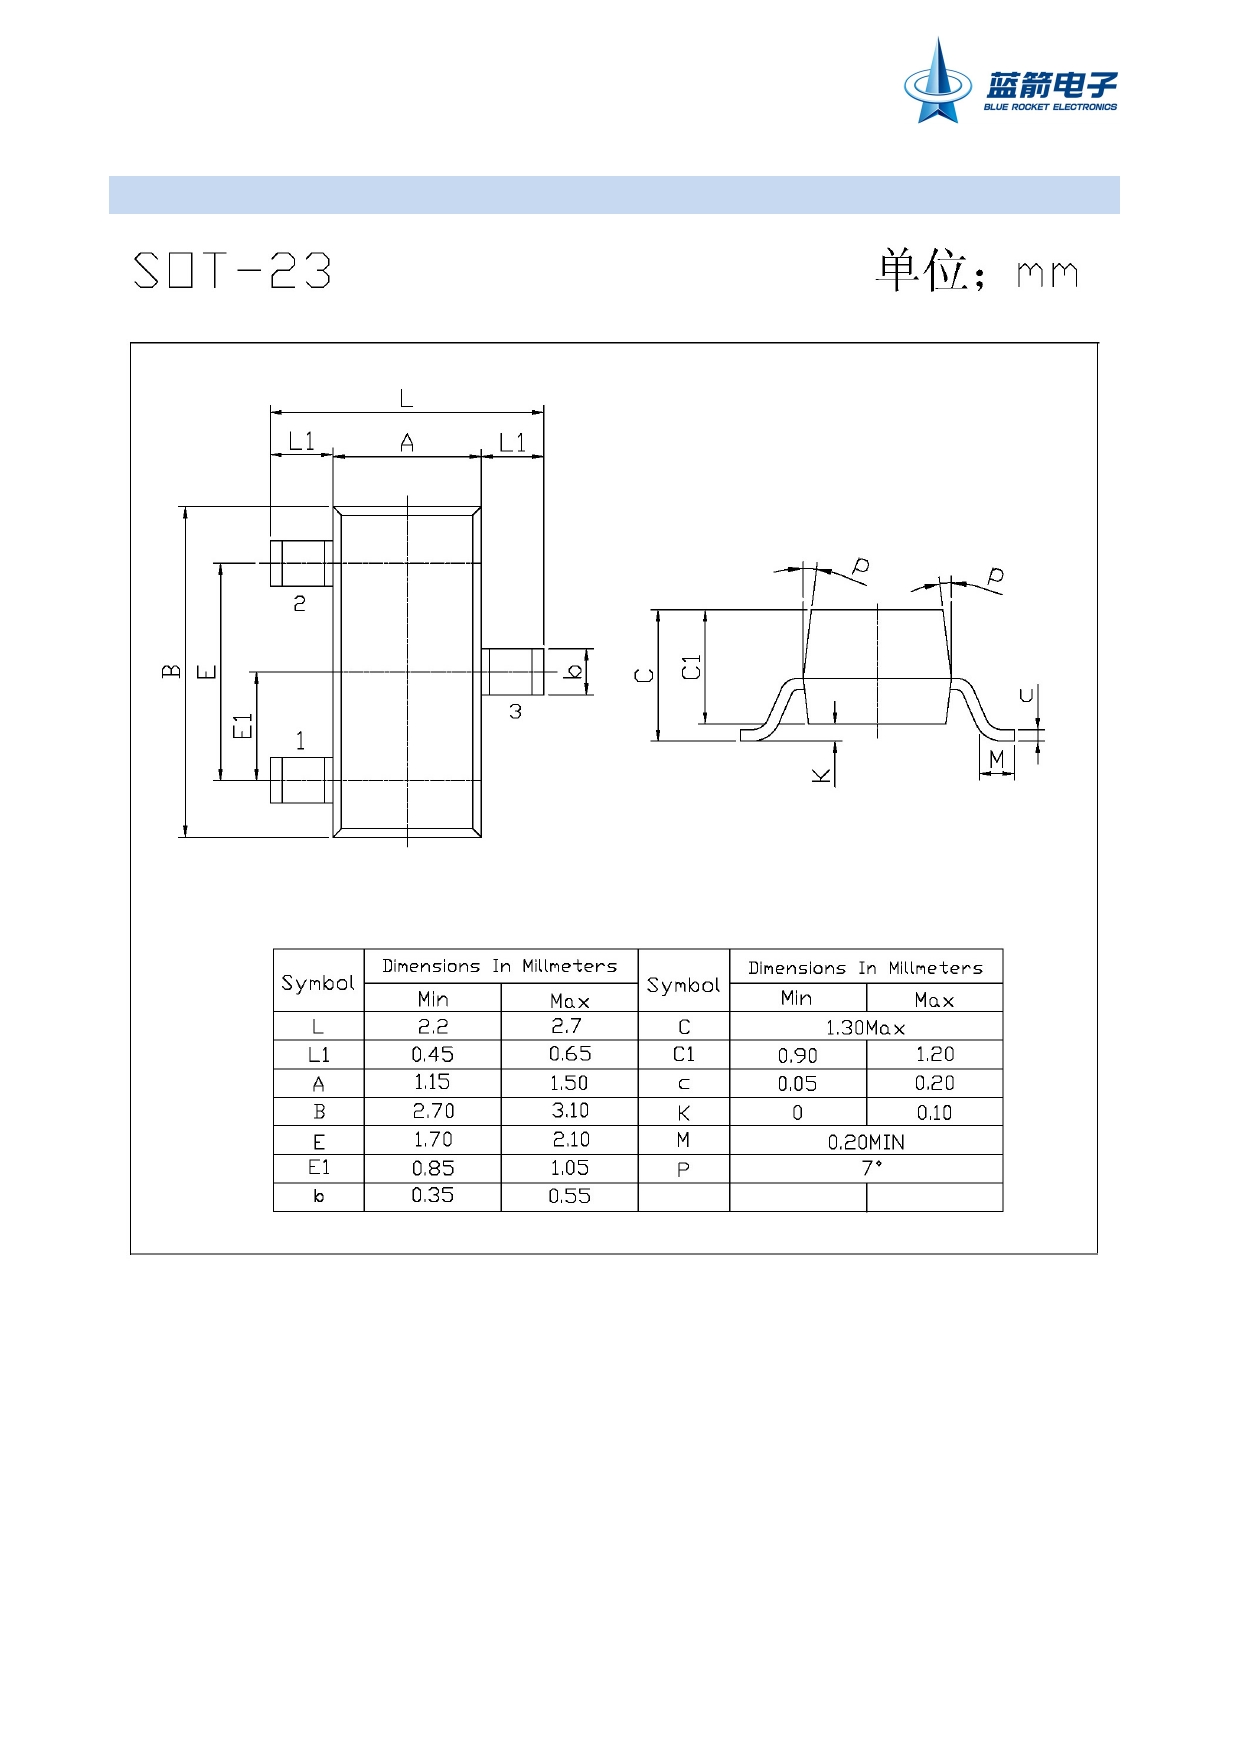 BCX71K pdf, 반도체, 판매, 대치품